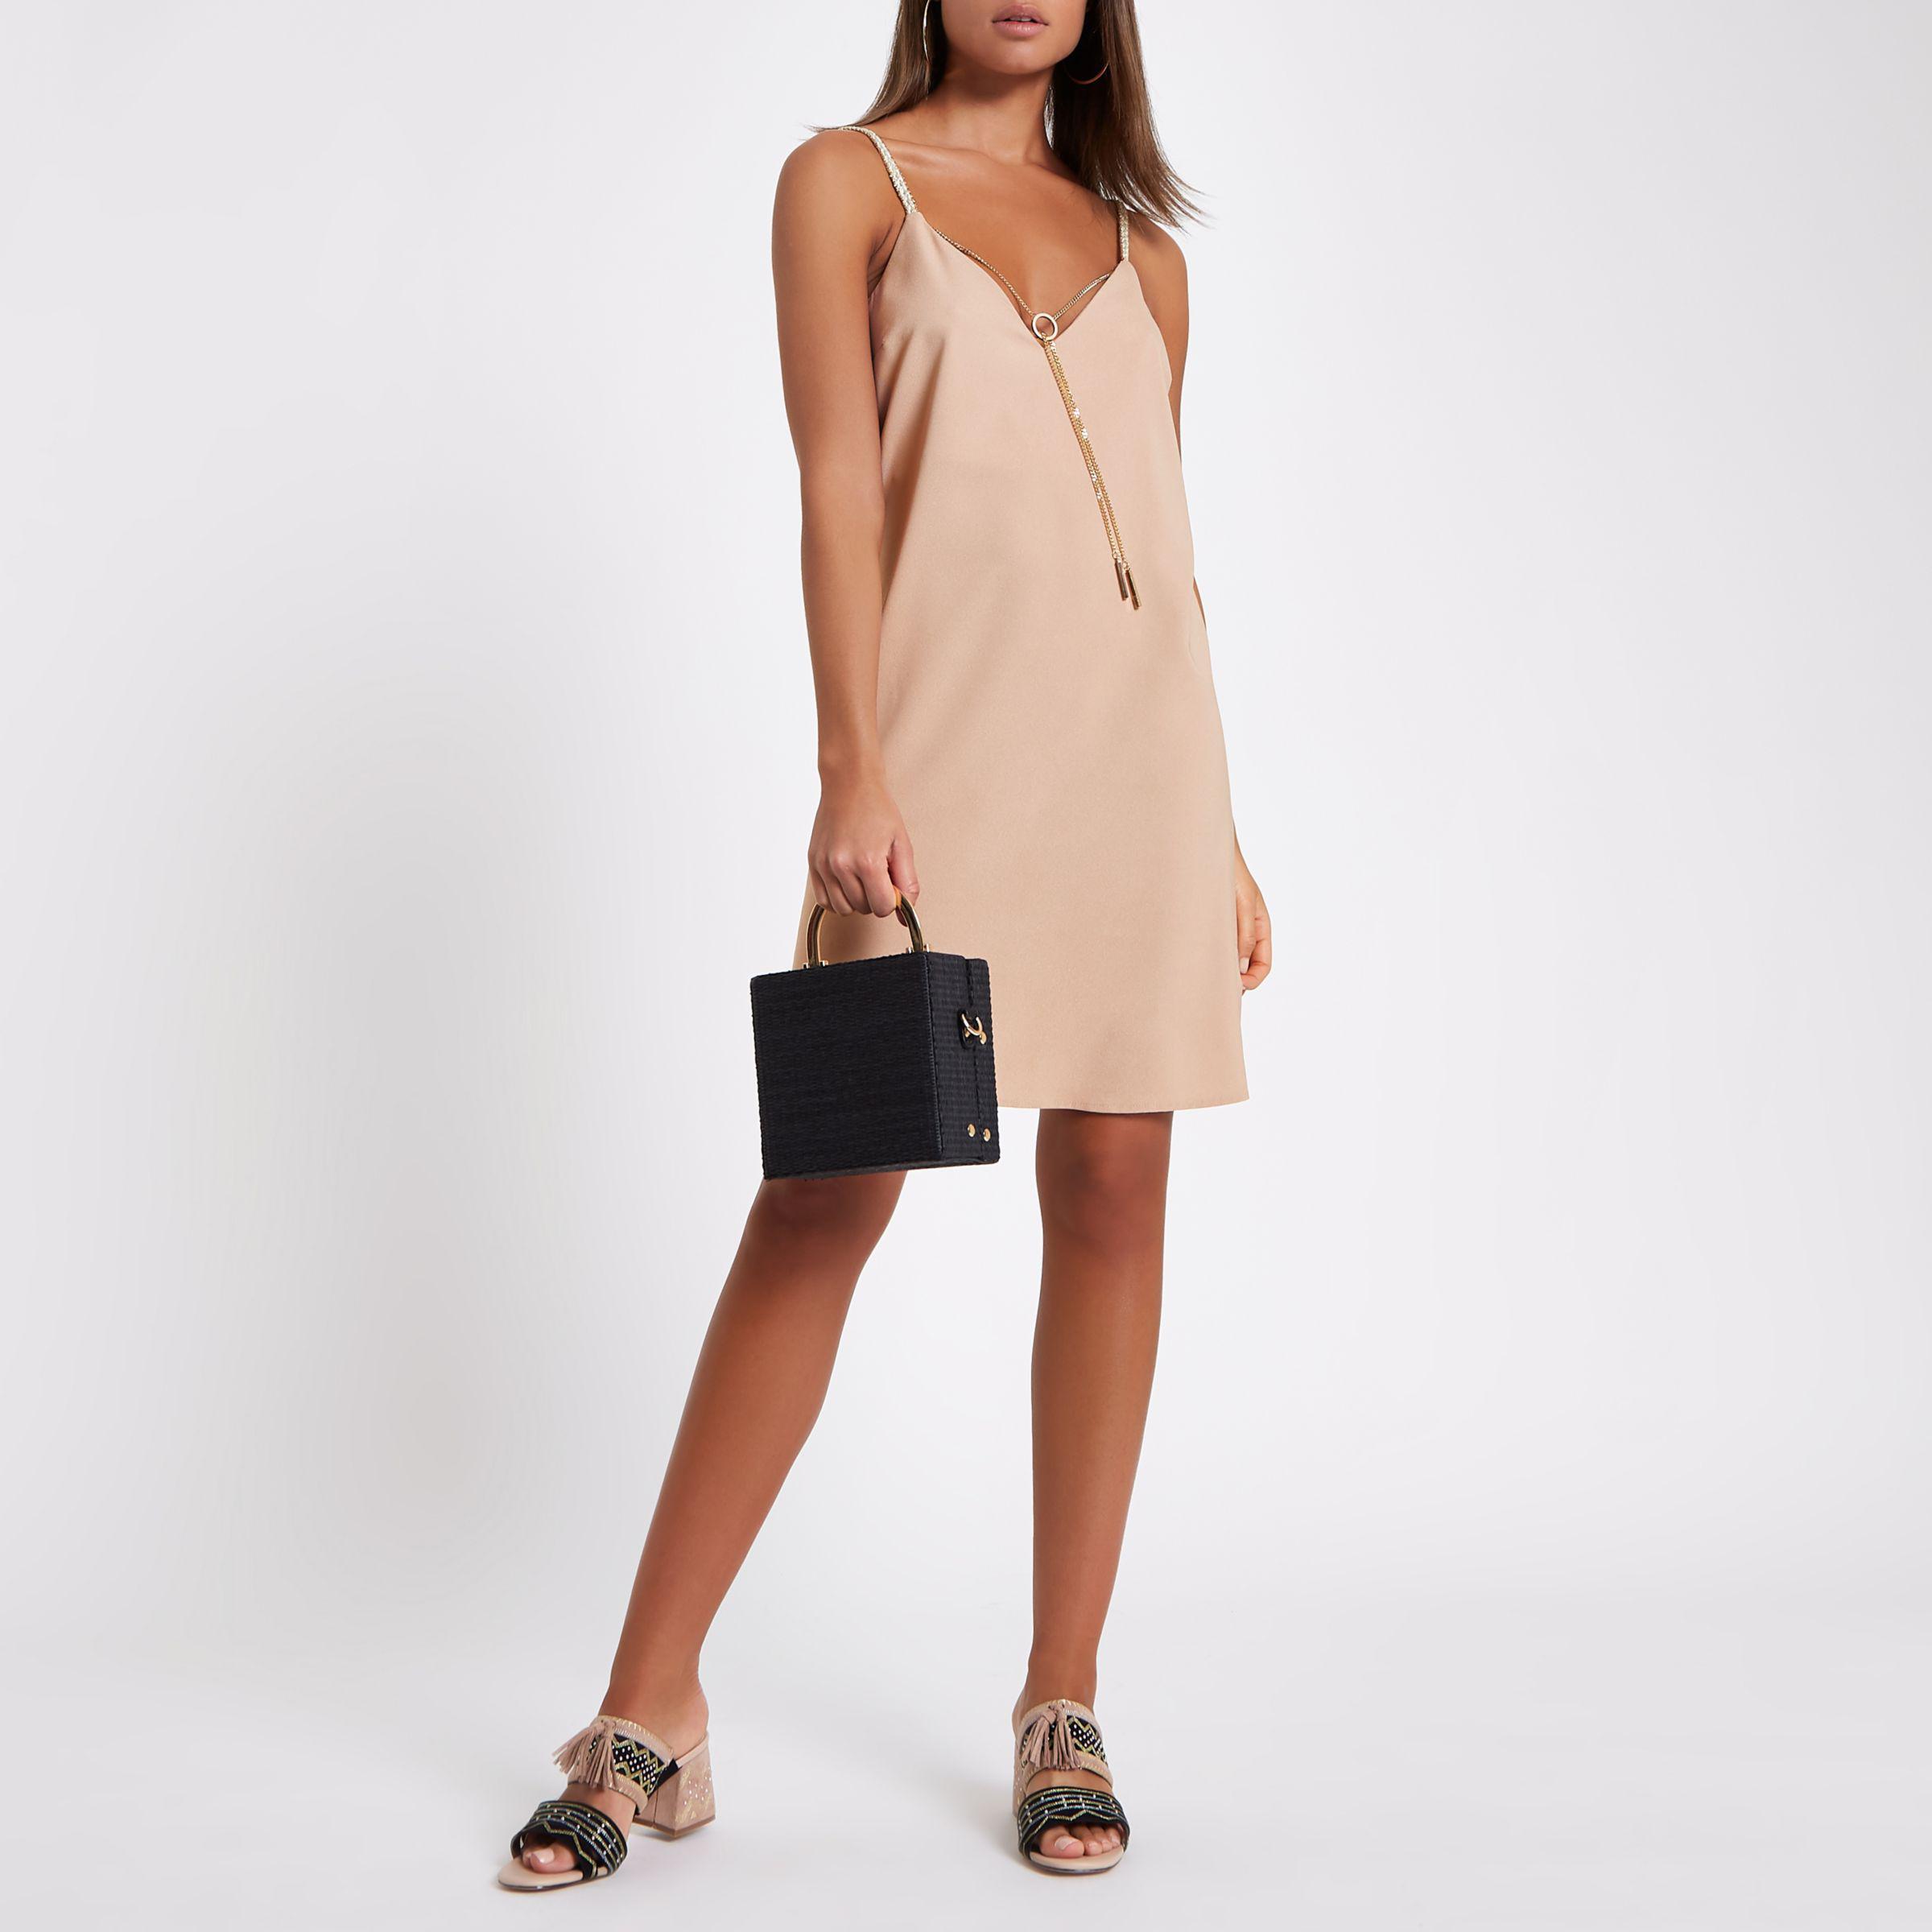 Enjoy Cheap Online Free Shipping New Arrival Womens Grey slip dress with detachable chain River Island Sale Amazon Discount Visit New Buy Cheap Pre Order AIzT3SqHJj